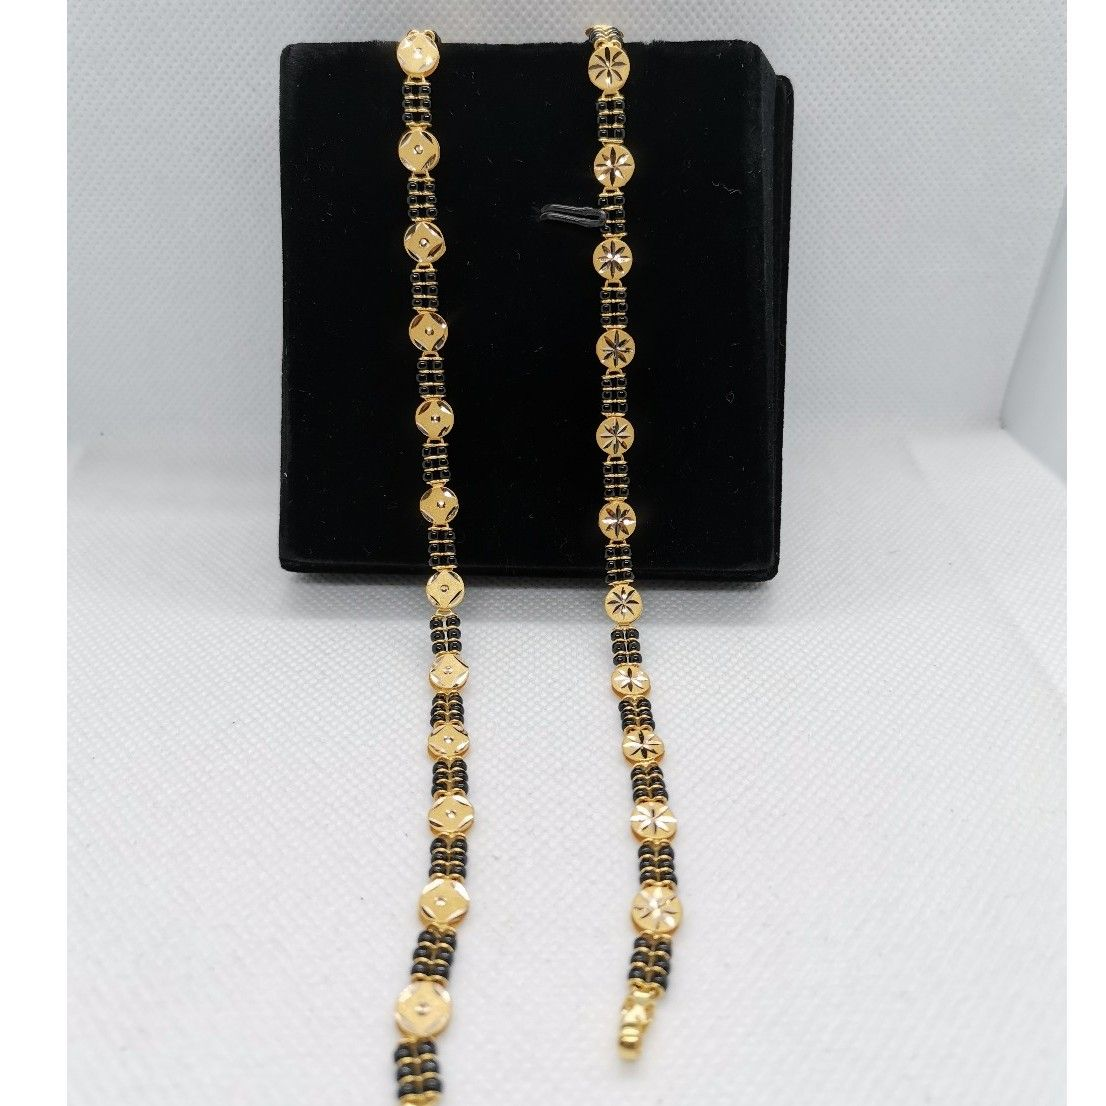 22k long mangalsutra chain 04